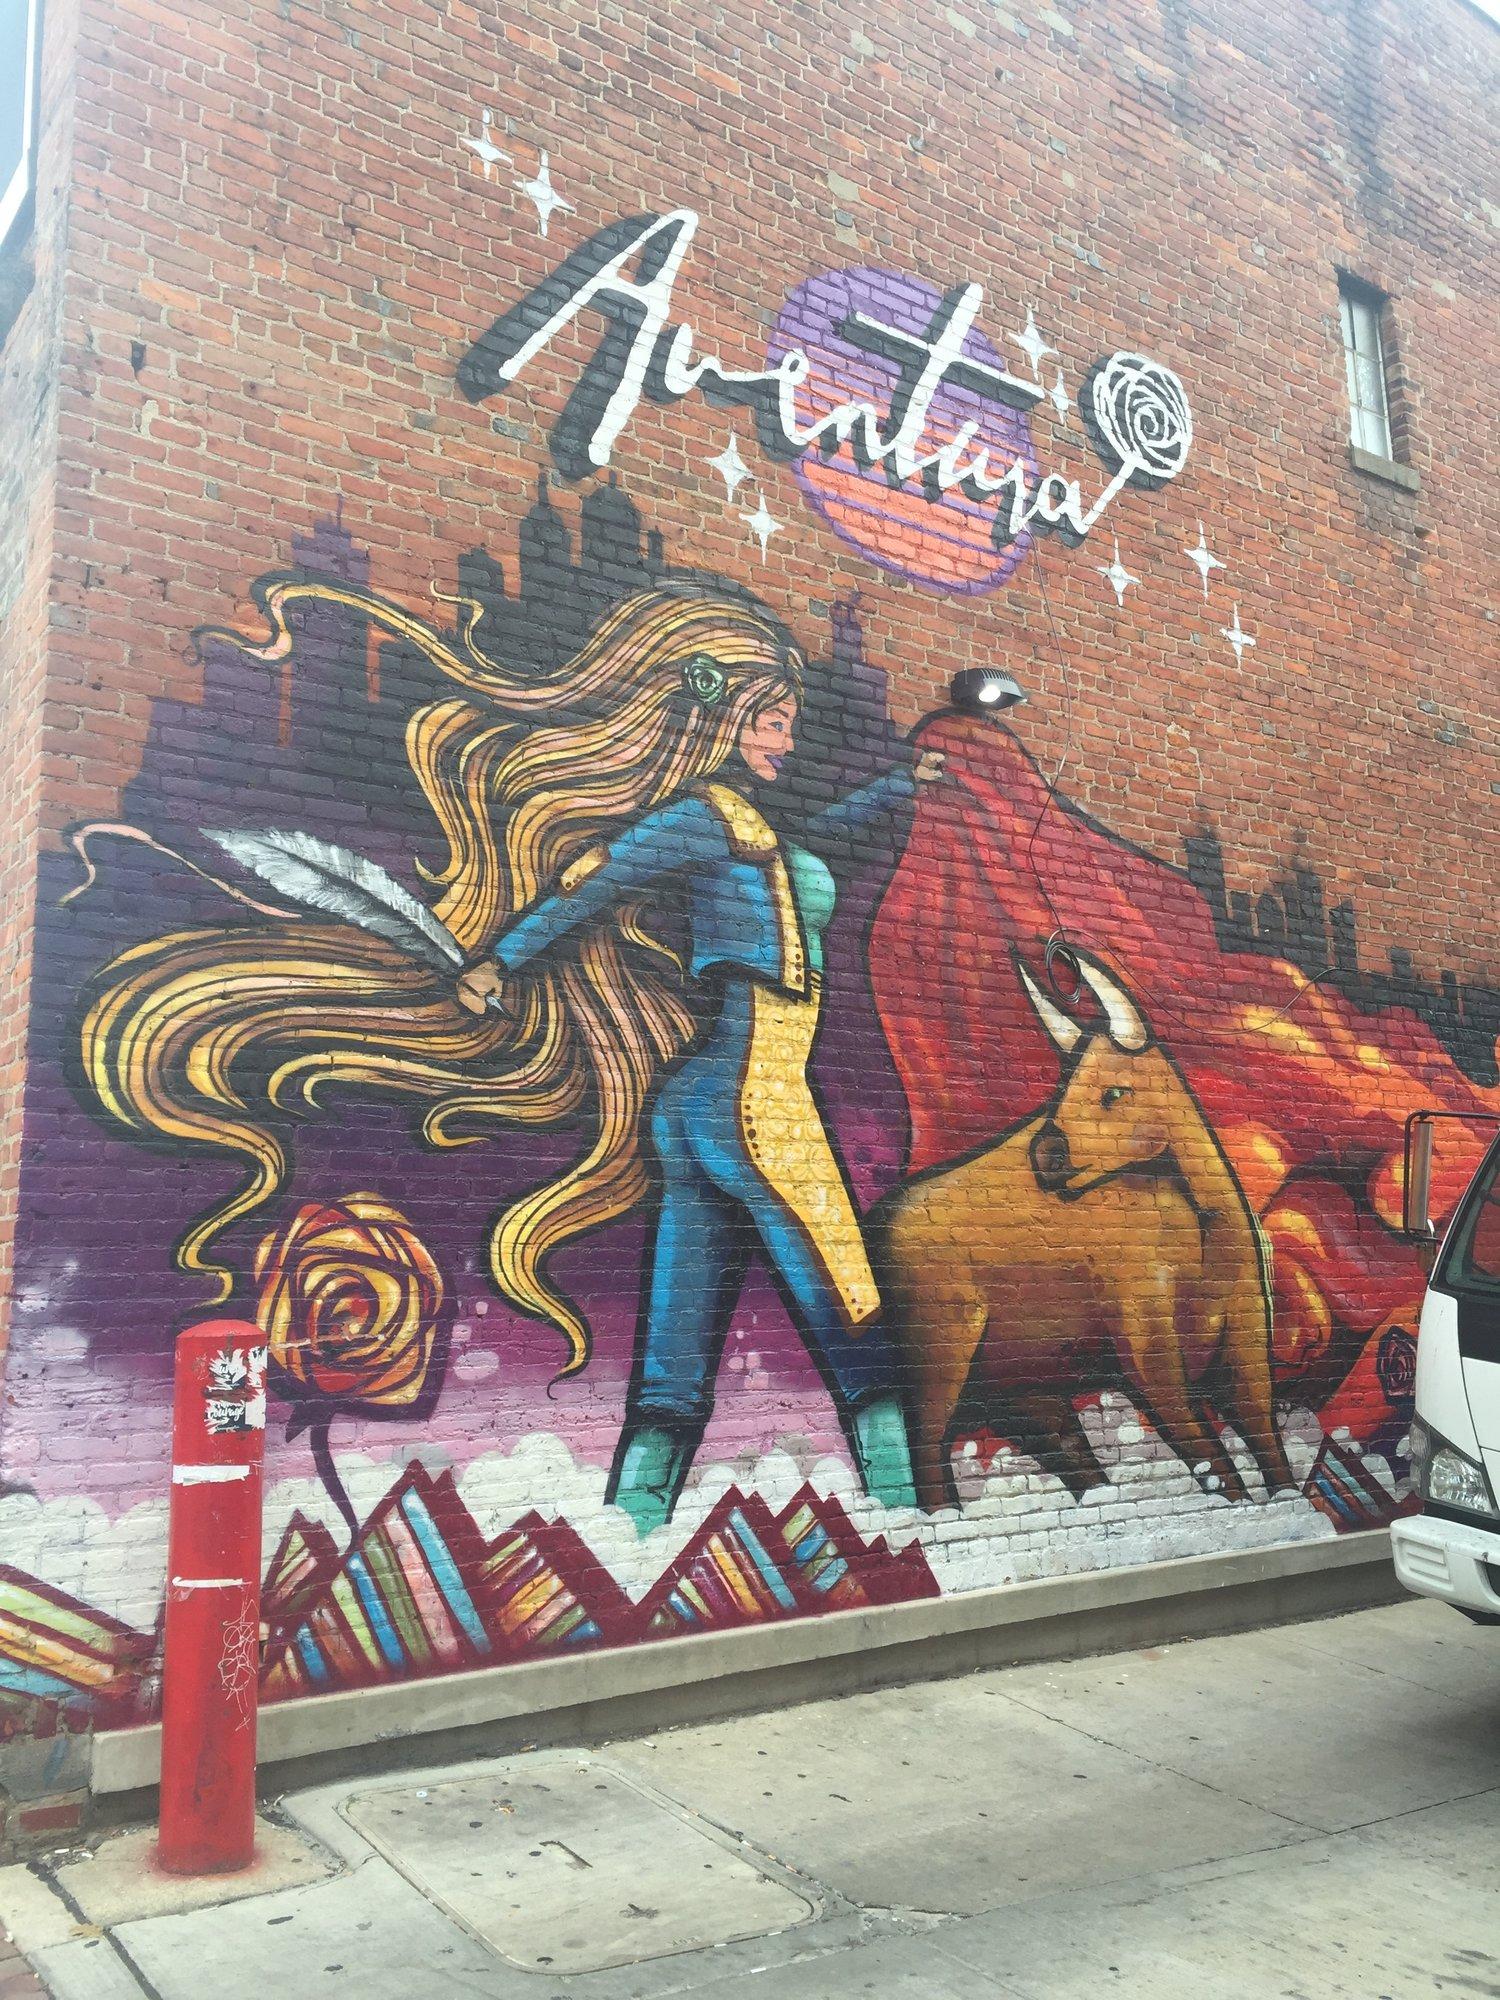 Graffiti wall ann arbor - Best Graffiti In Ann Arbor Michigan